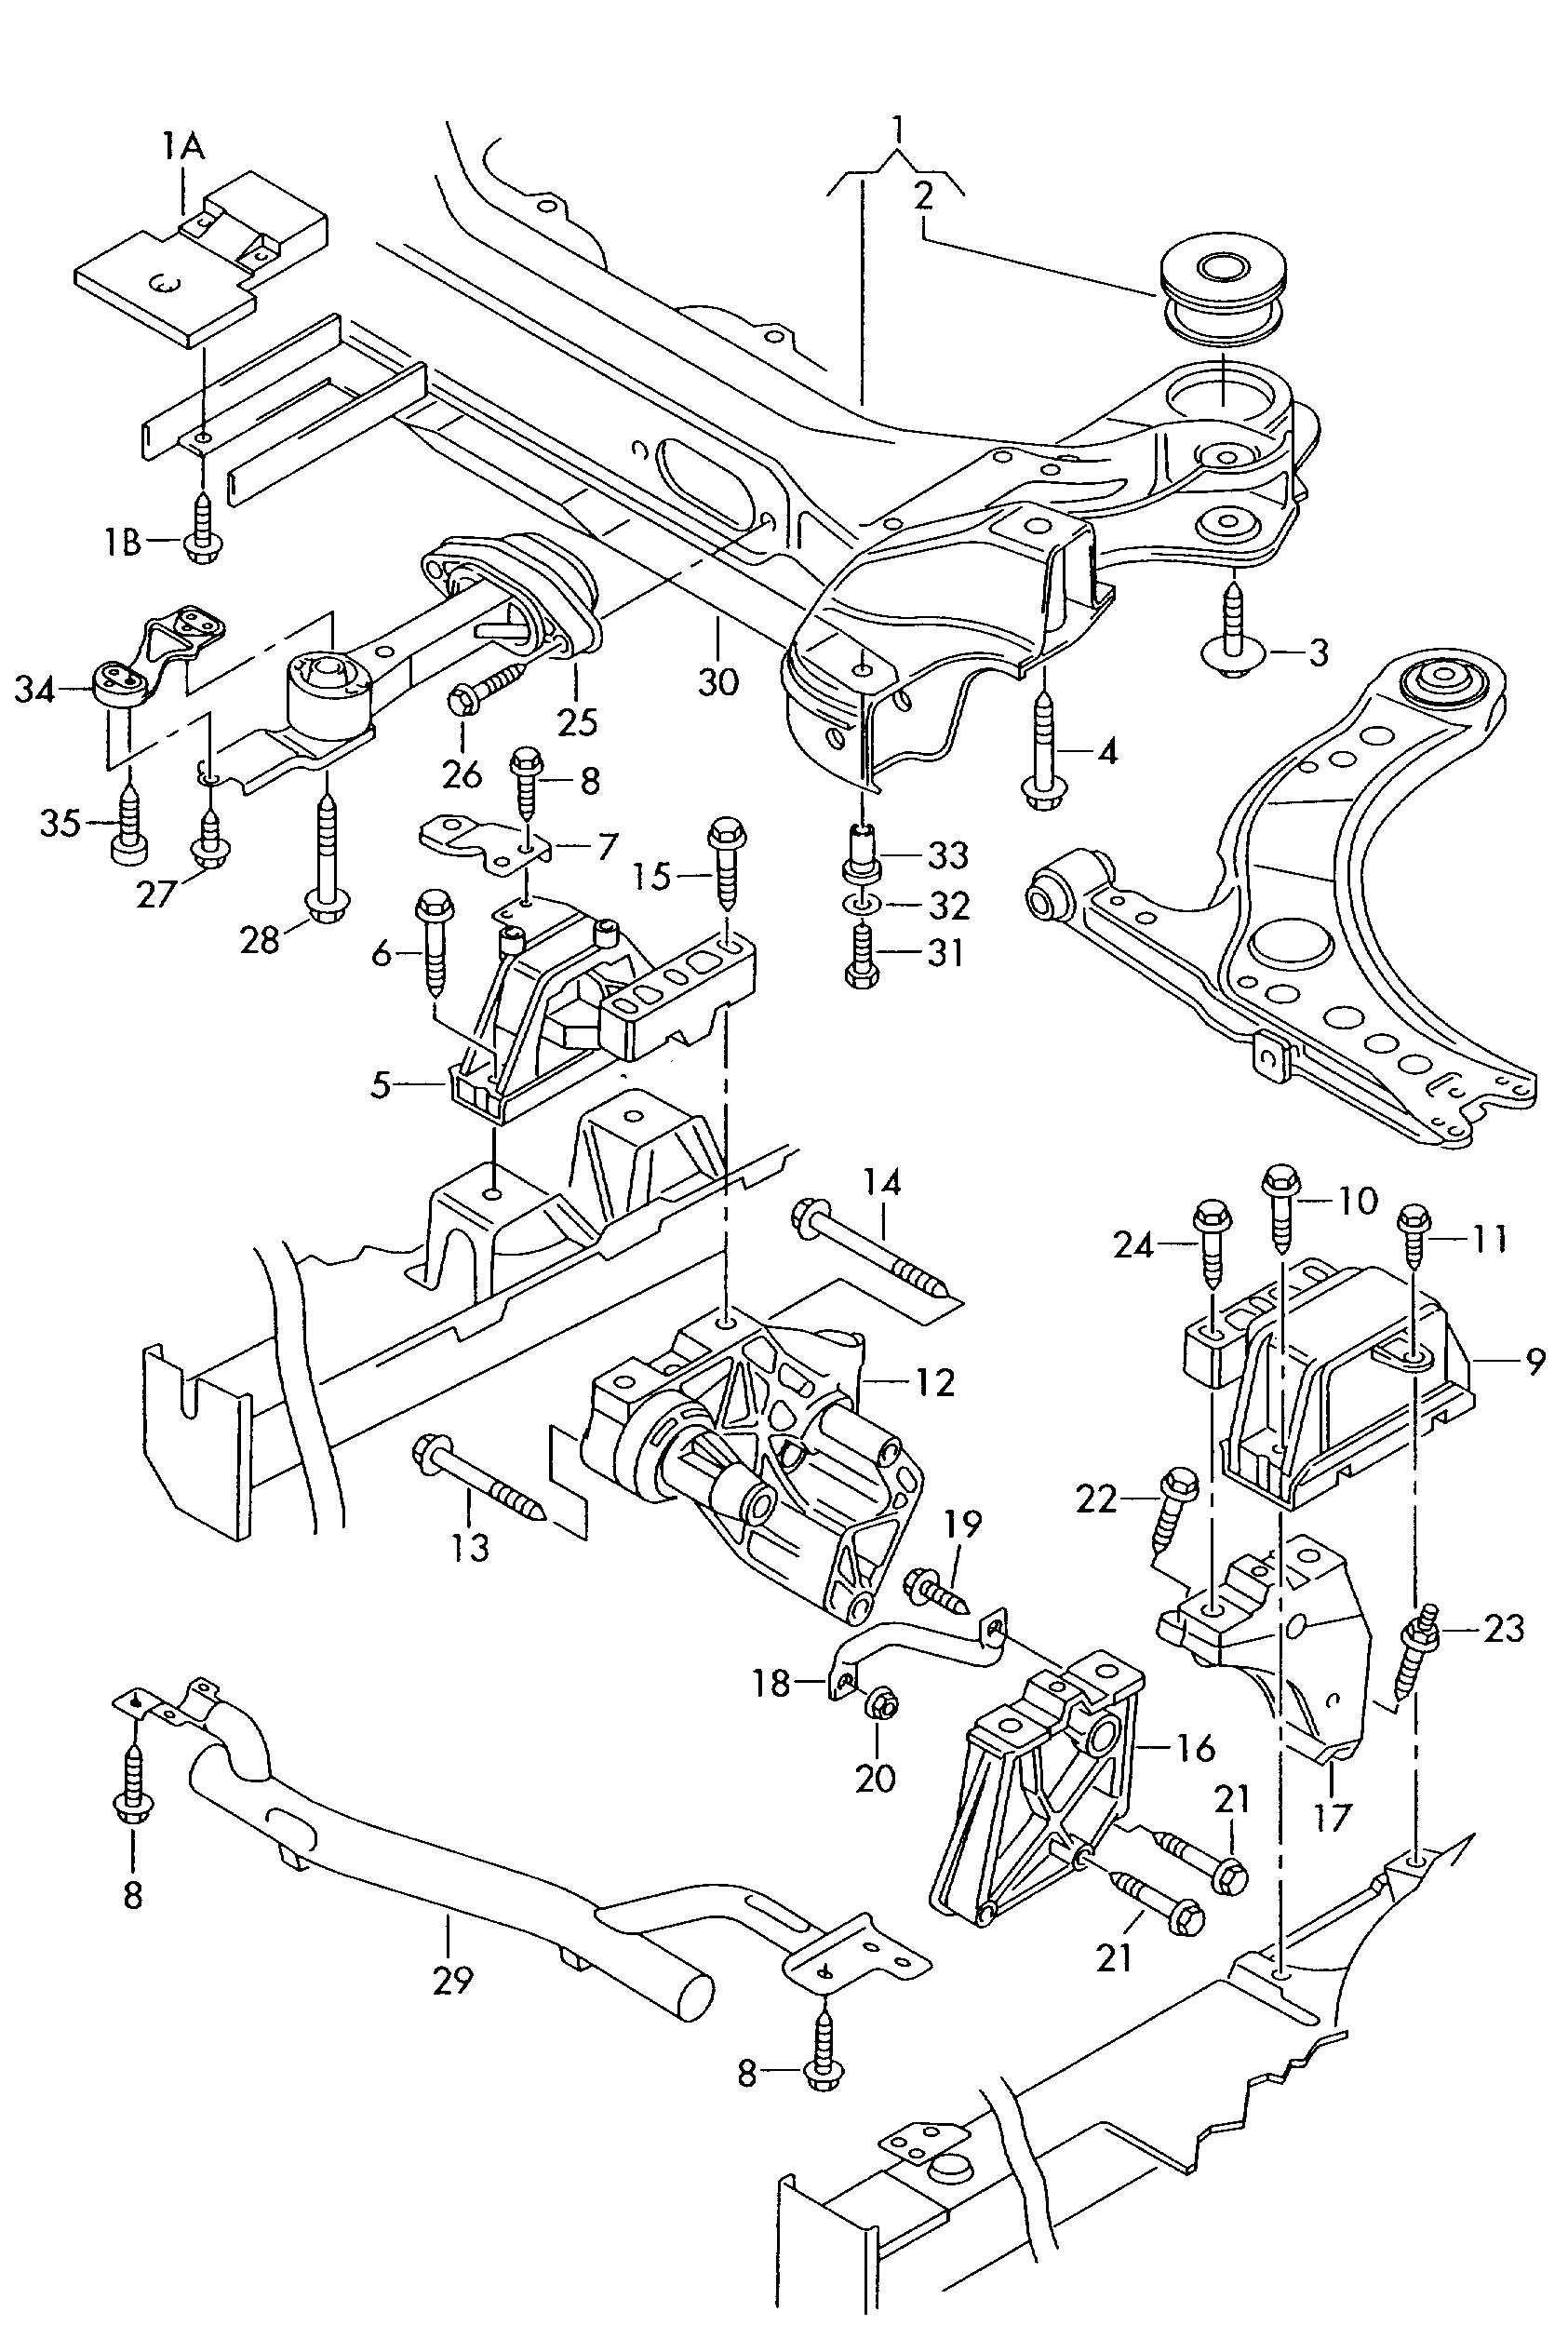 2001 vw beetle alternator wiring diagram marathon boat lift motor database bug engine parts library 62